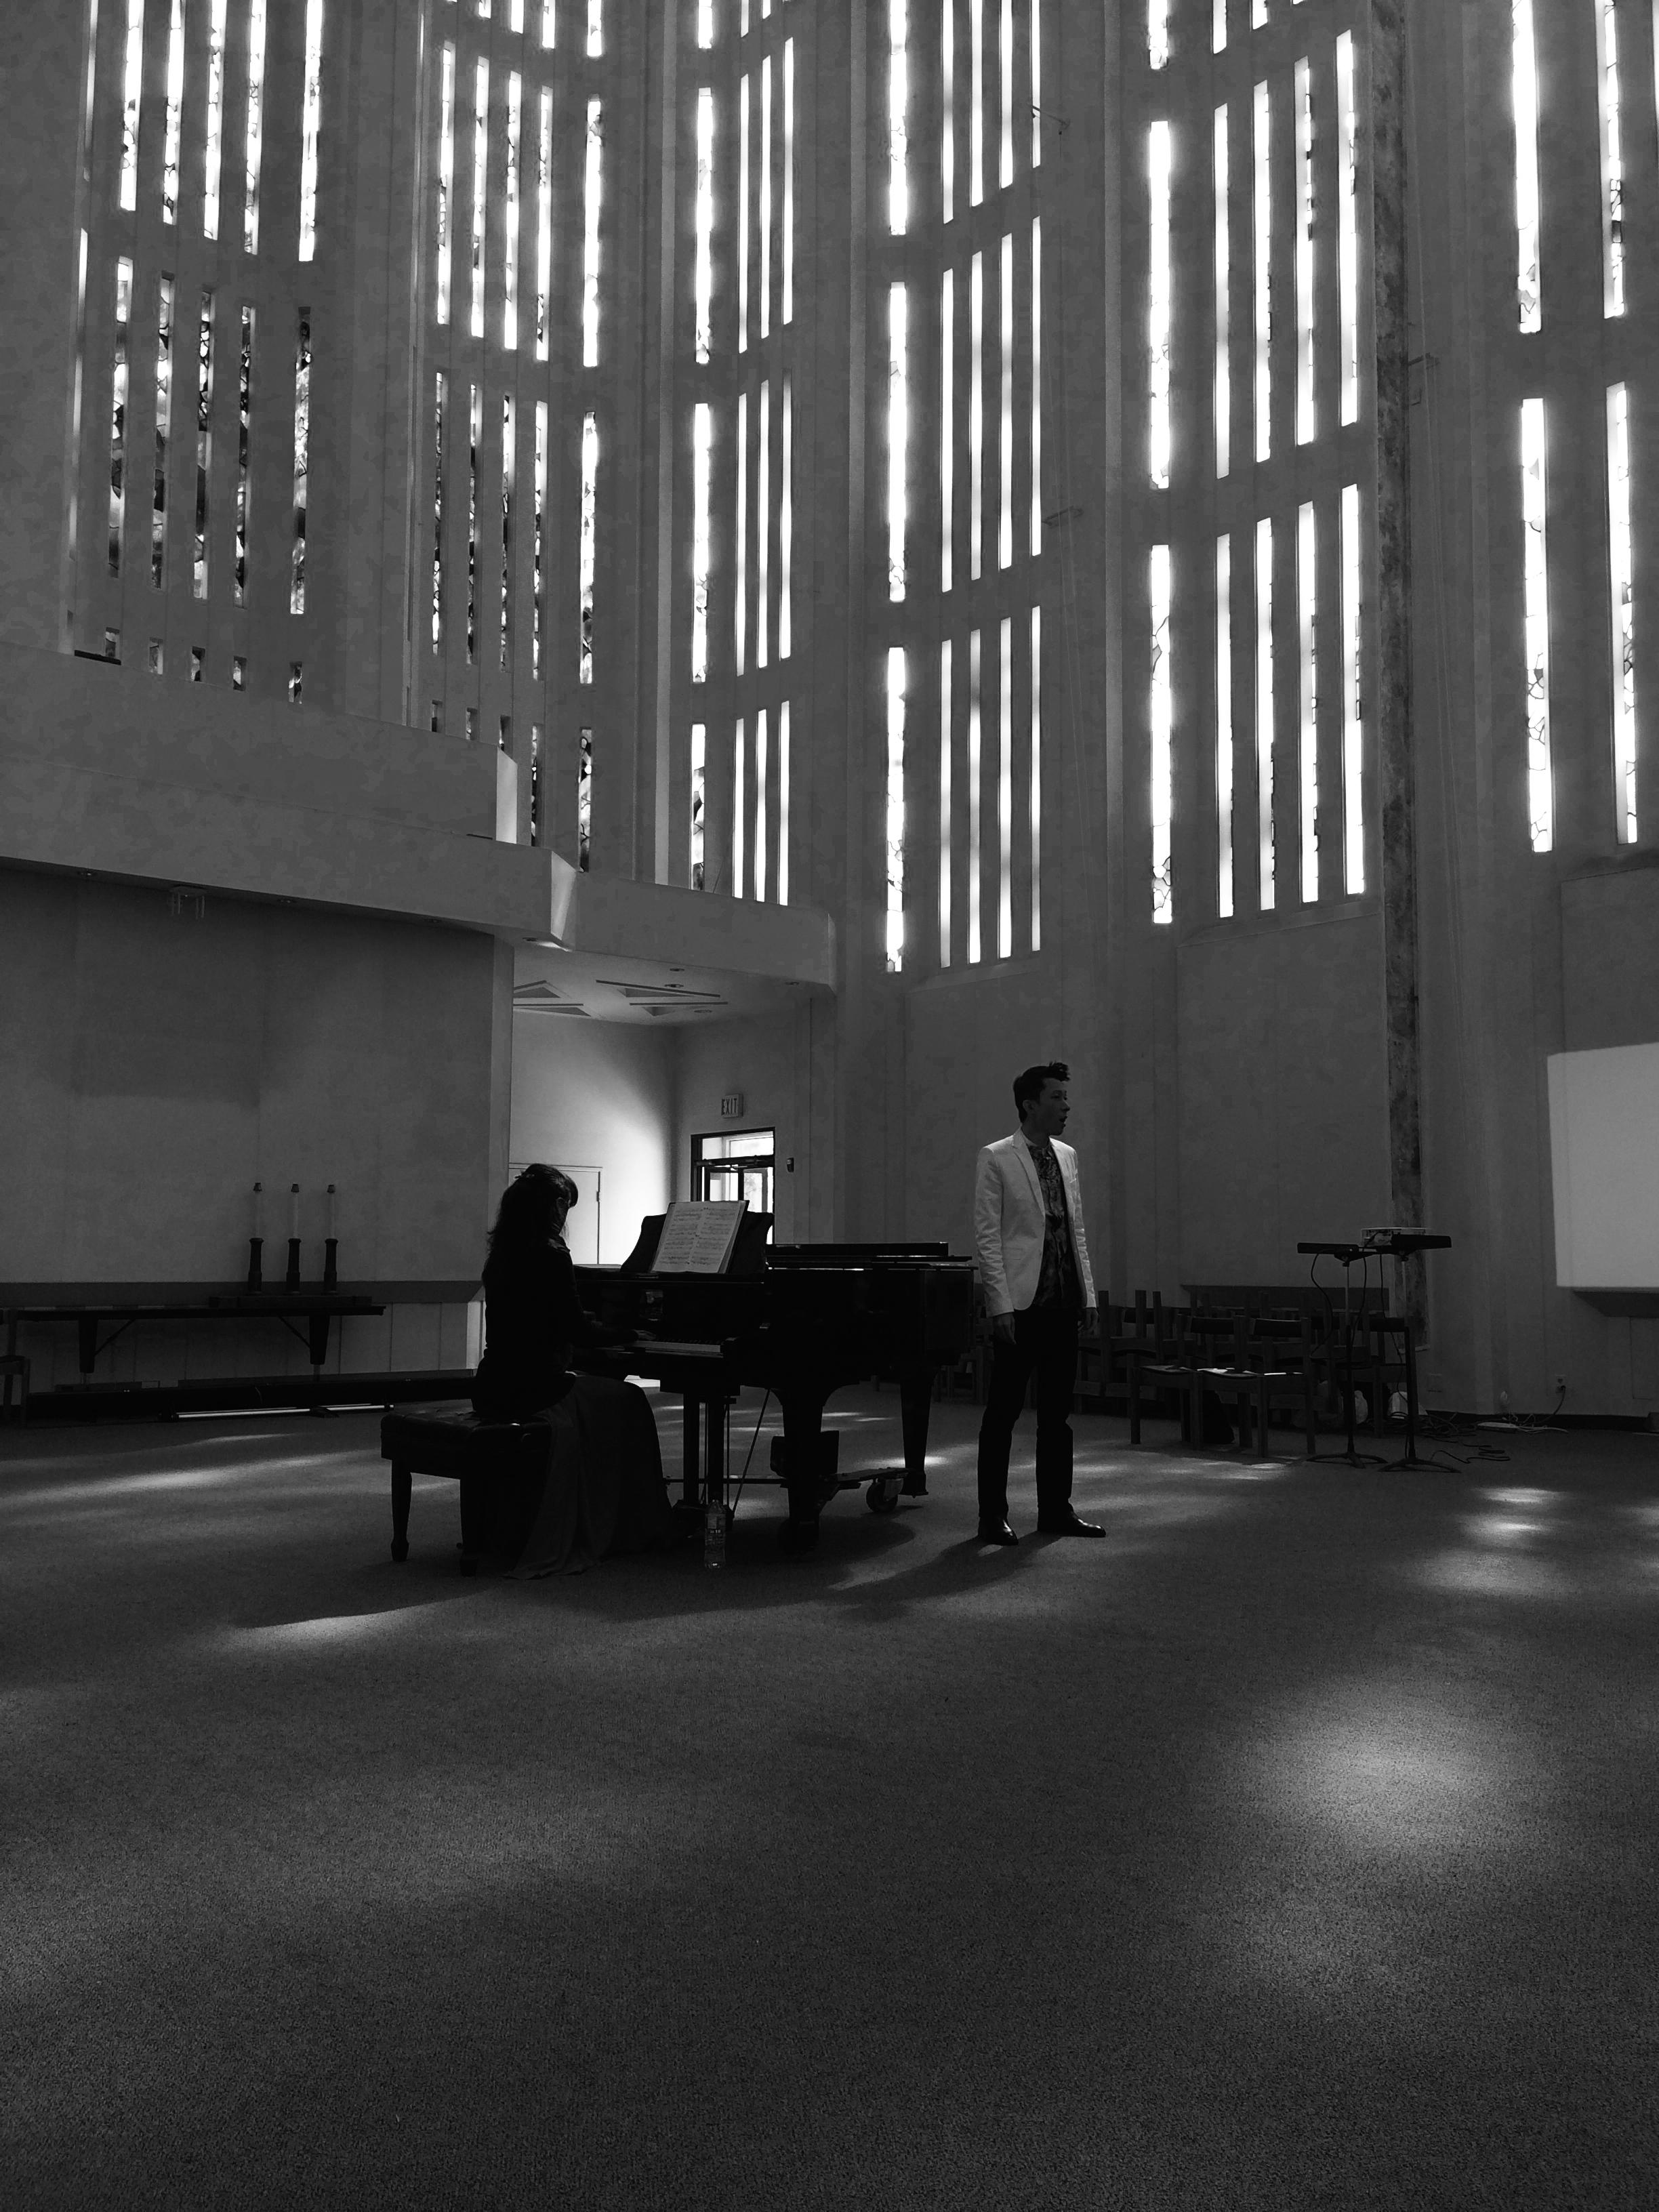 Kresge Chapel Performance. Photo by PL